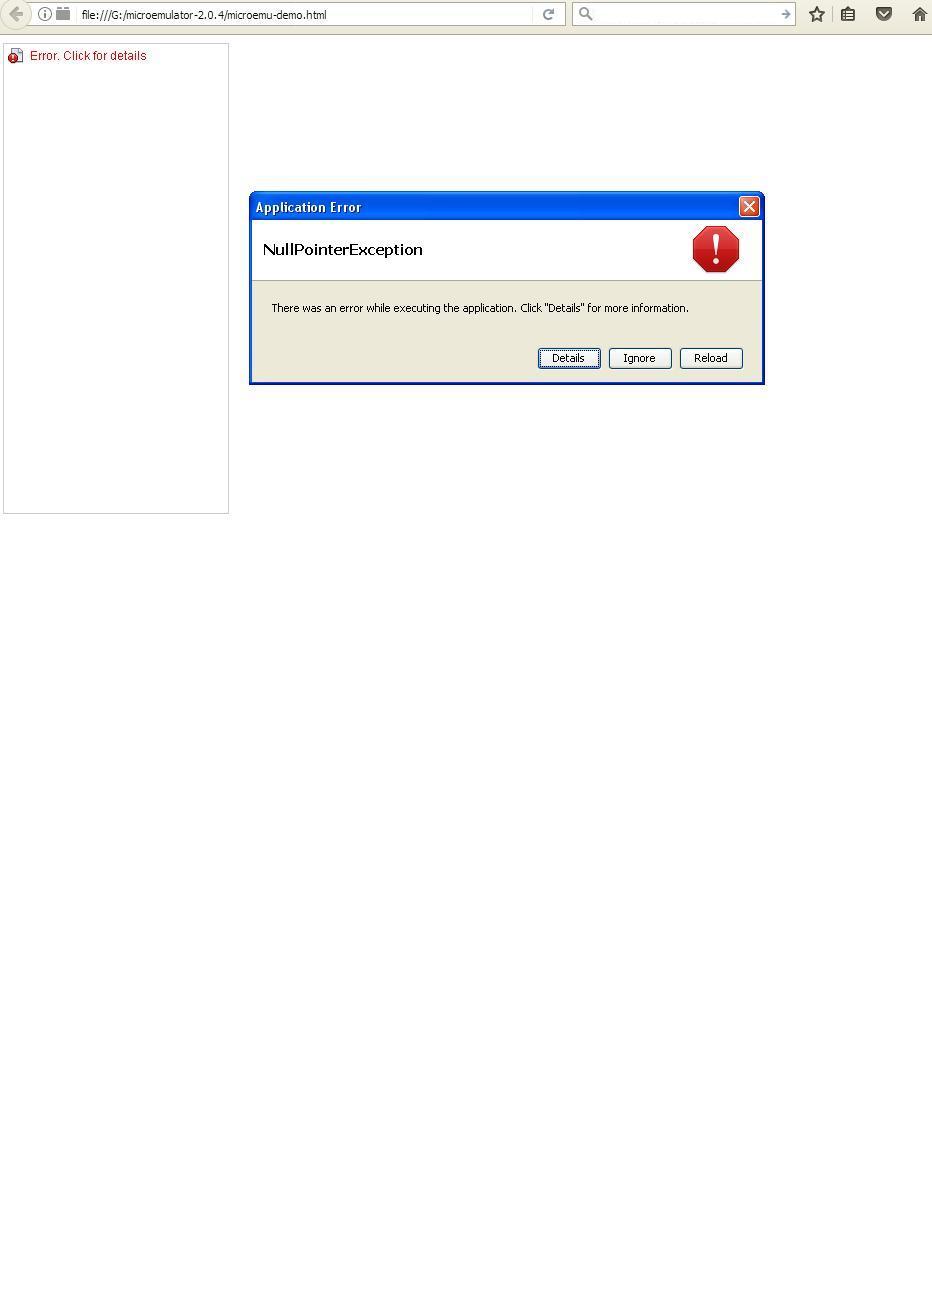 Cannot use opera-mini emulator | Opera forums